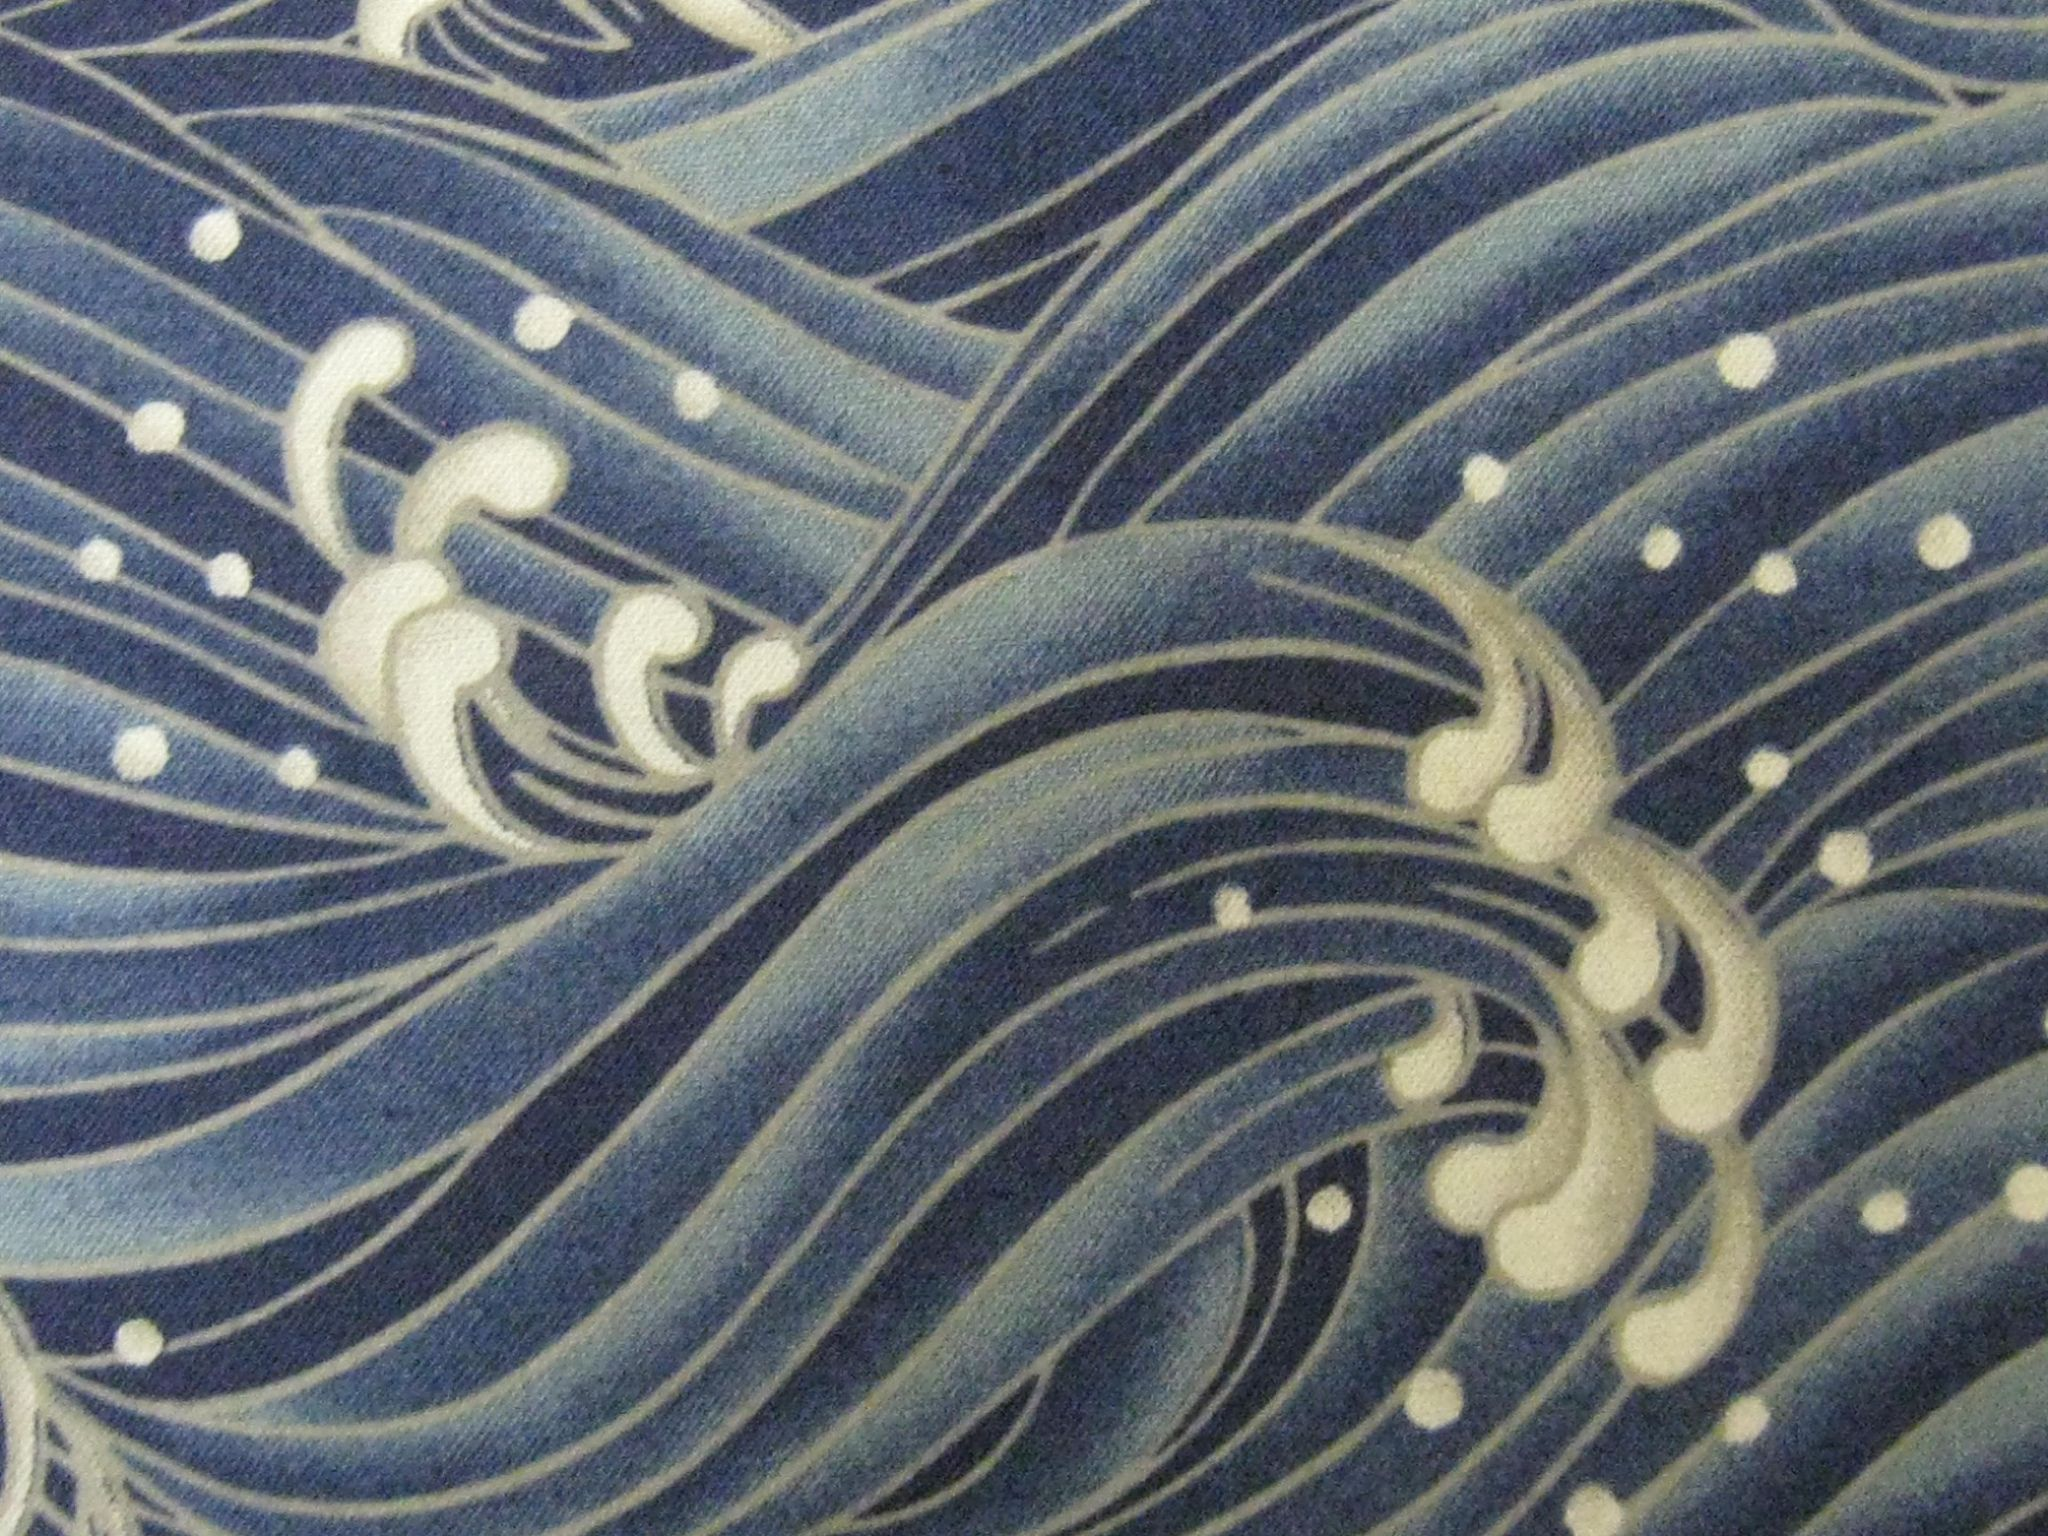 Japanese Cotton Kimono Fabric - Traditional Crashing Waves ...